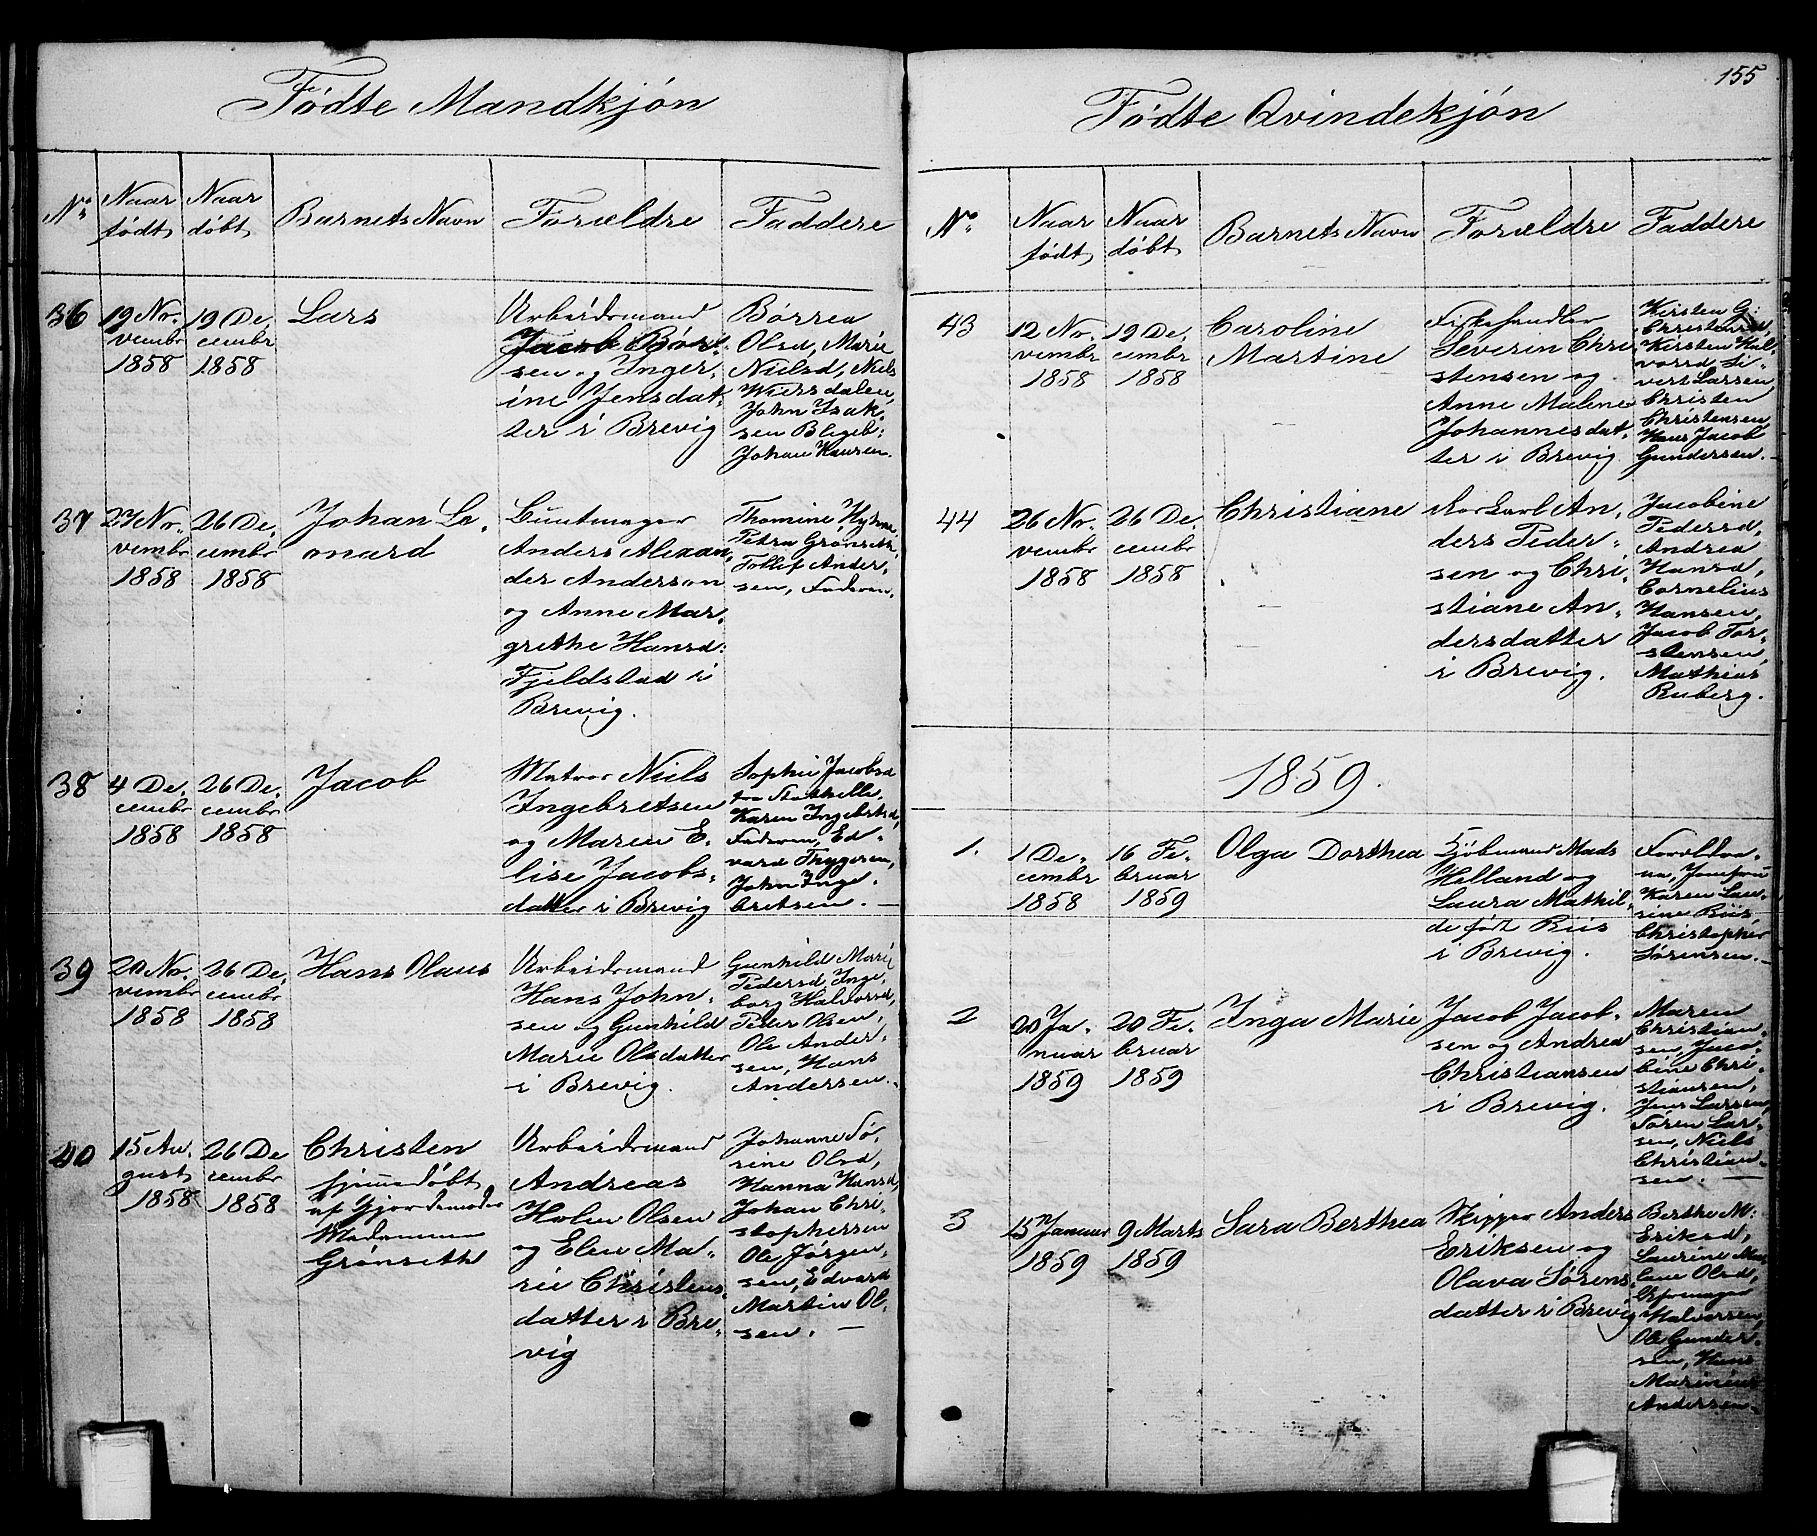 SAKO, Brevik kirkebøker, G/Ga/L0002: Klokkerbok nr. 2, 1846-1865, s. 155